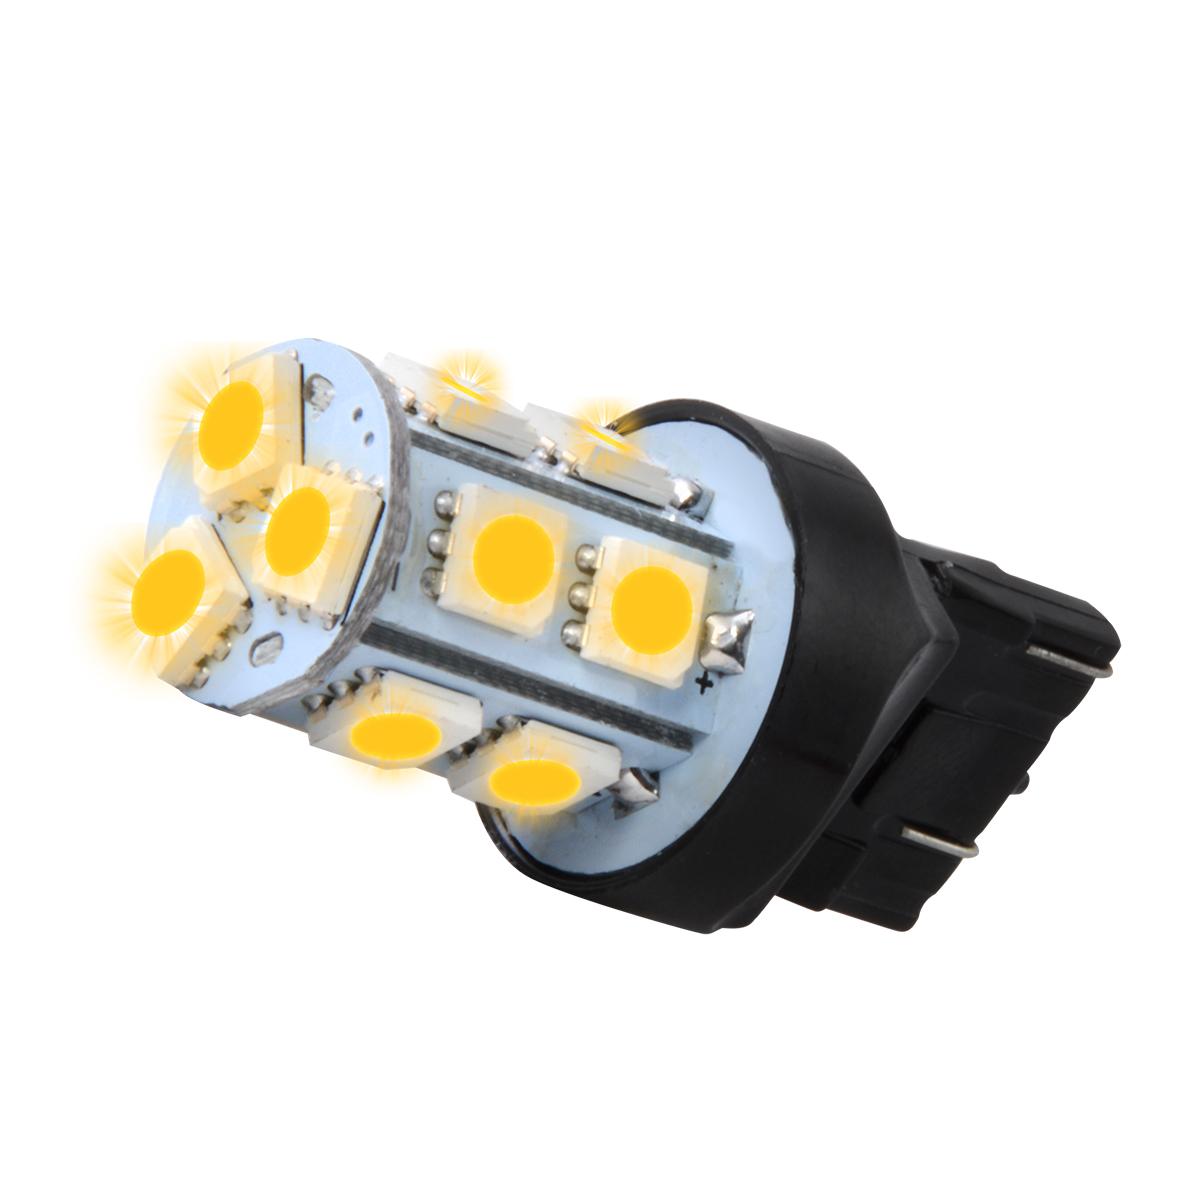 70580 #7440 Tower Style 13 LED Light Bulb